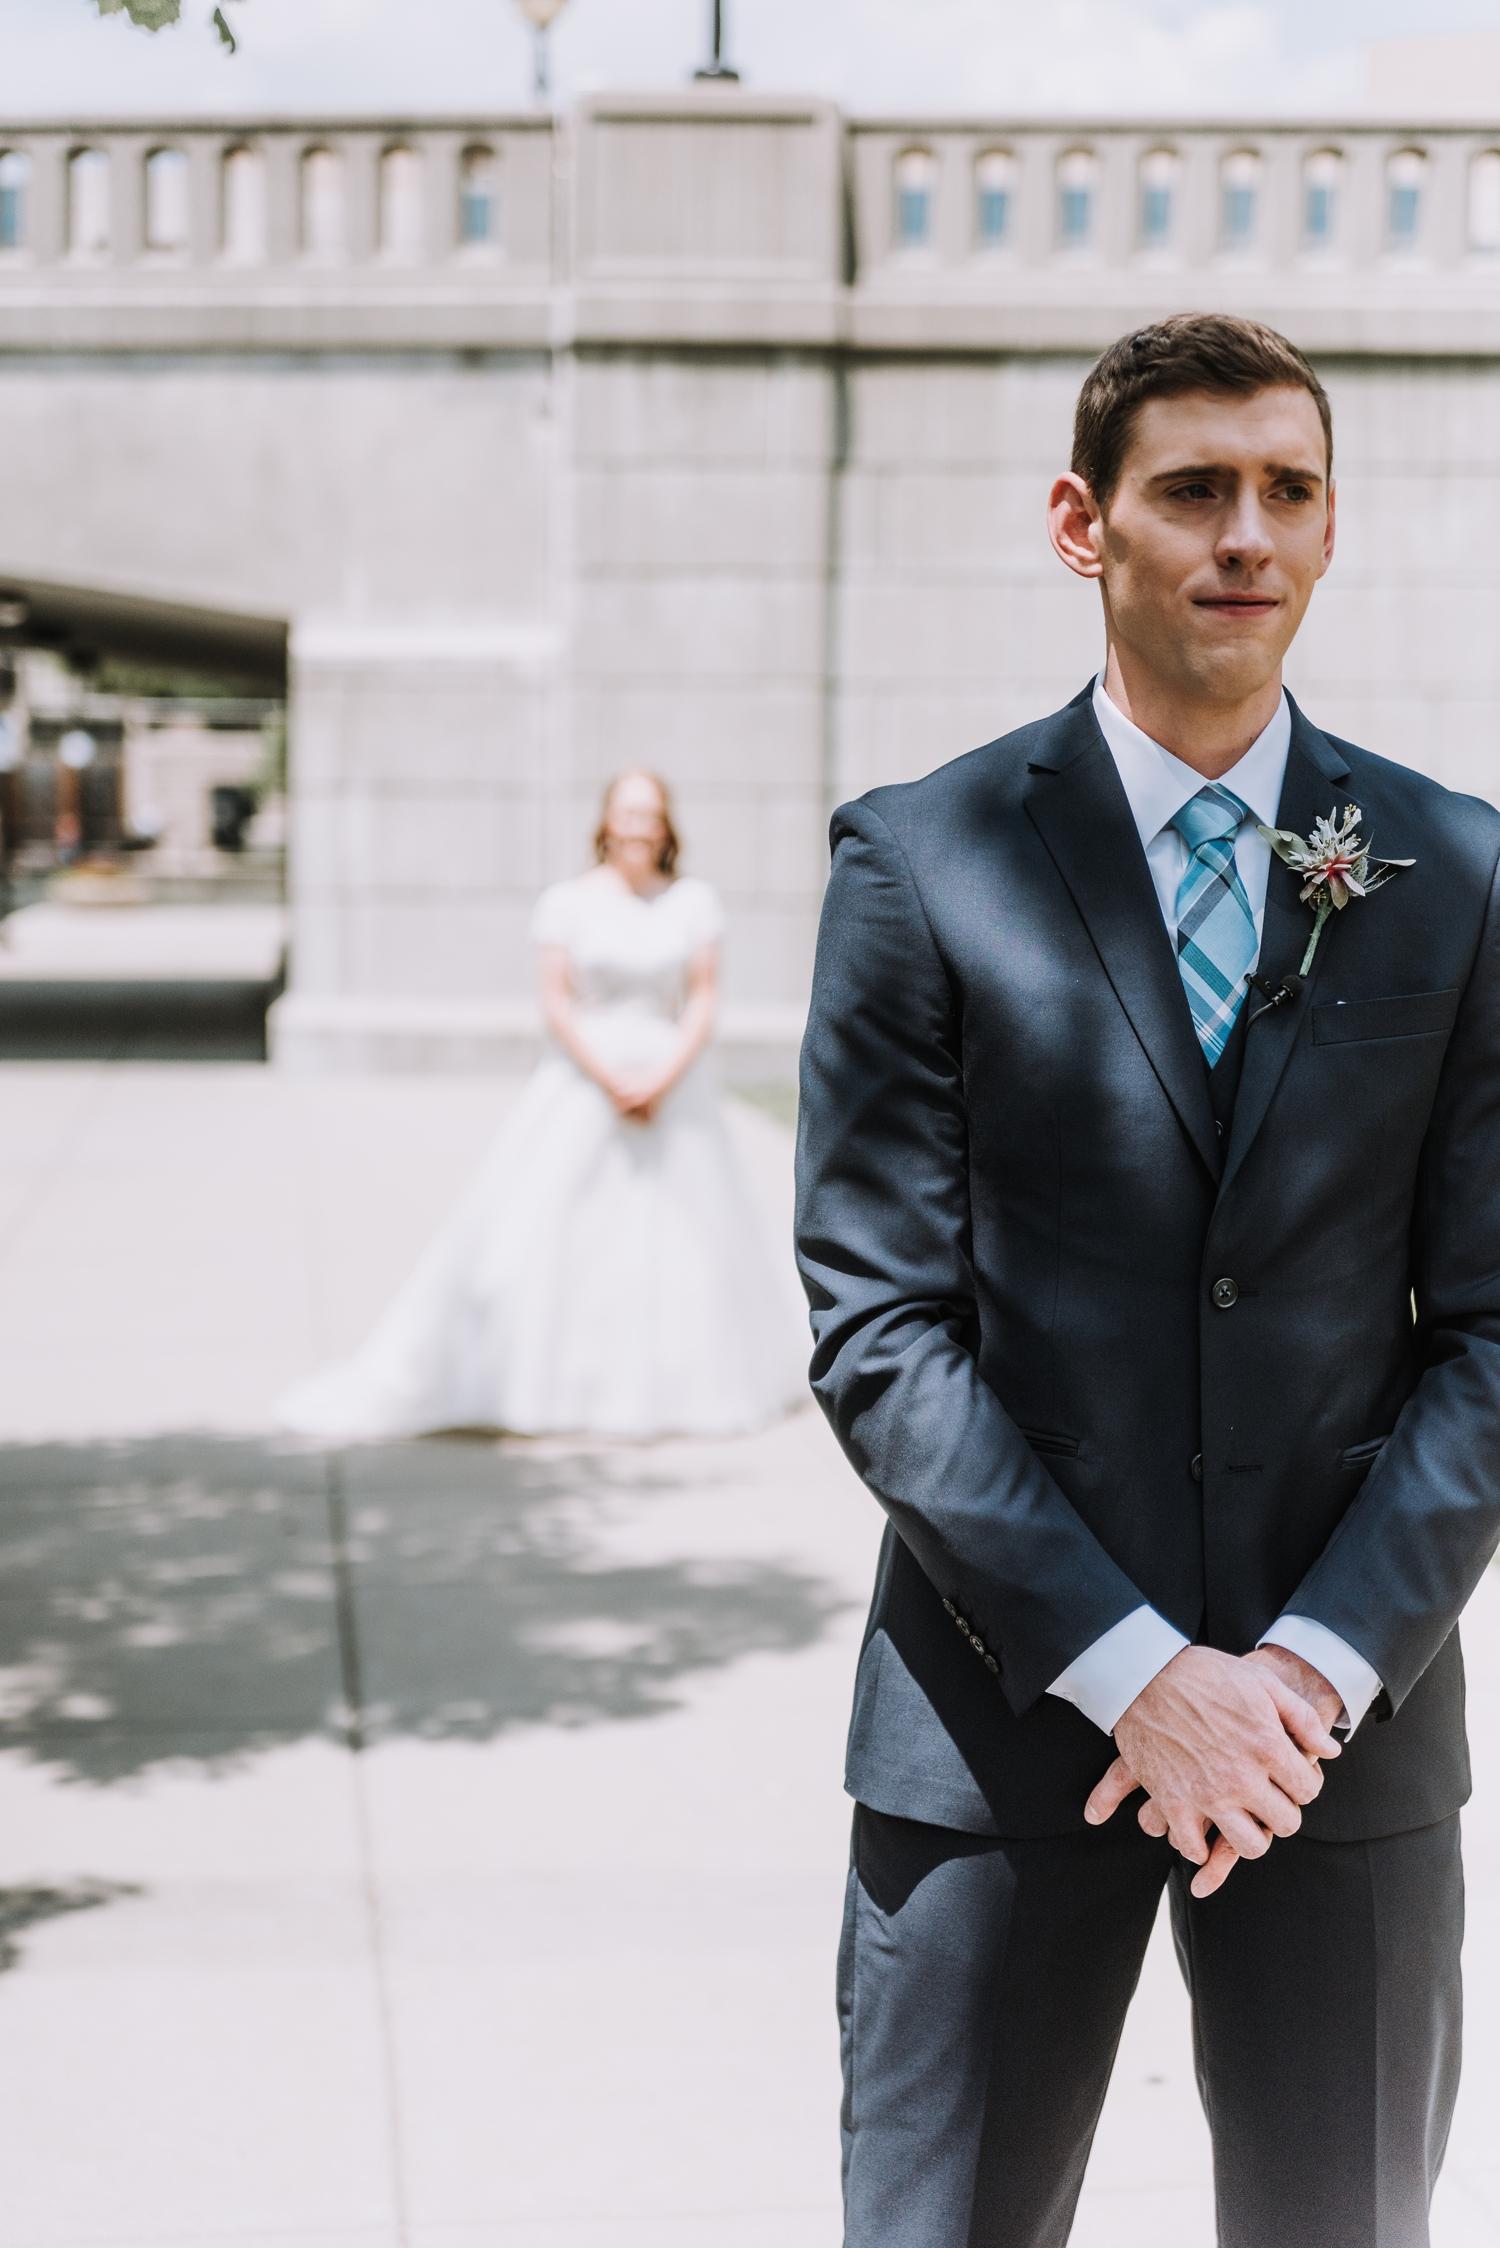 Online Groom Tux Rentals - Classic Indianapolis Wedding - Canal 337 Wedding - The Overwhelmed Bride Wedding Blog